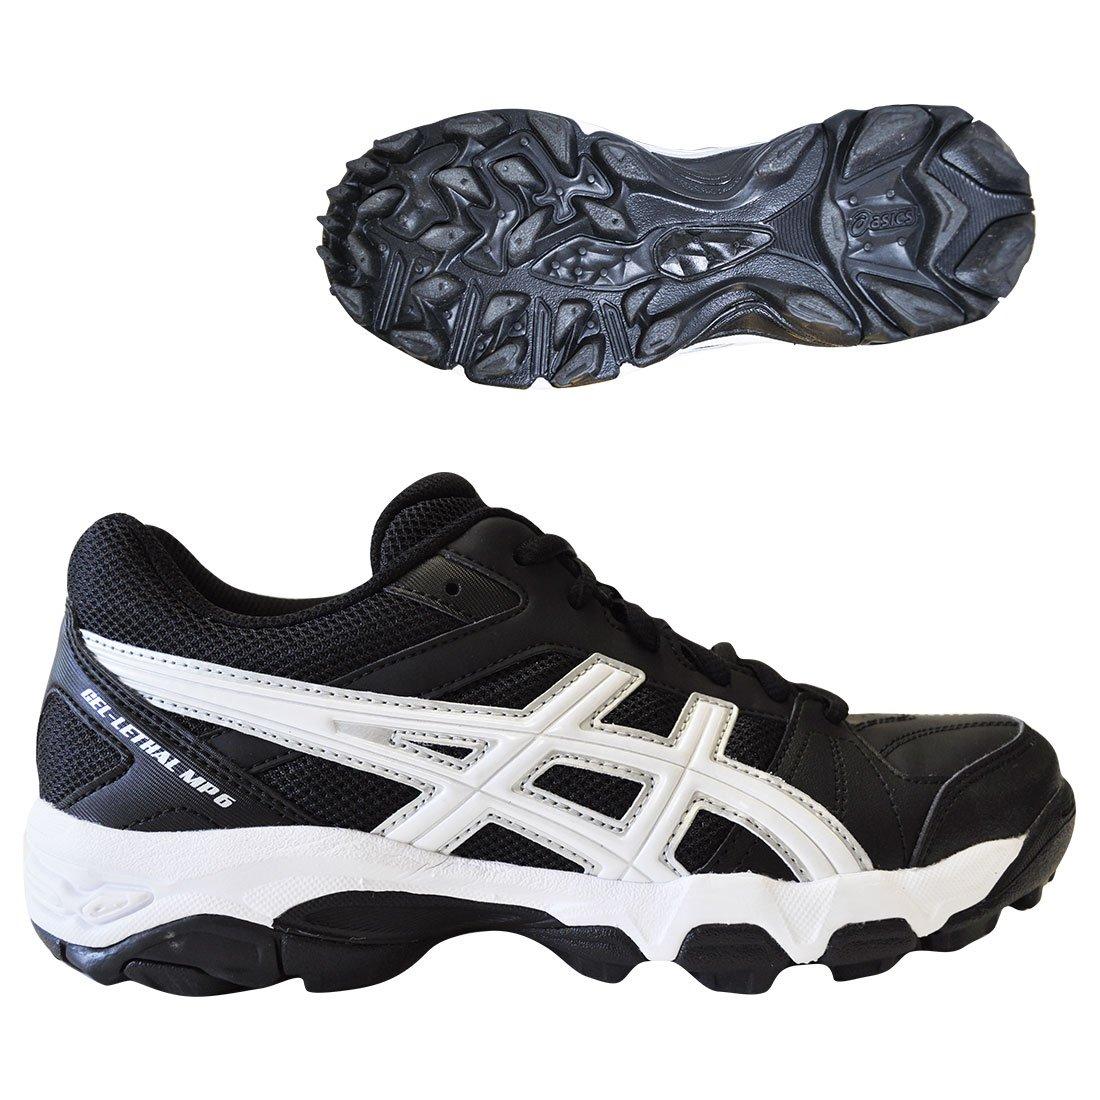 33bfae21f4fc ASICS Gel-Lethal MP6 Turf Shoe- Black White - Women s Size 7  Amazon.co.uk   Shoes   Bags